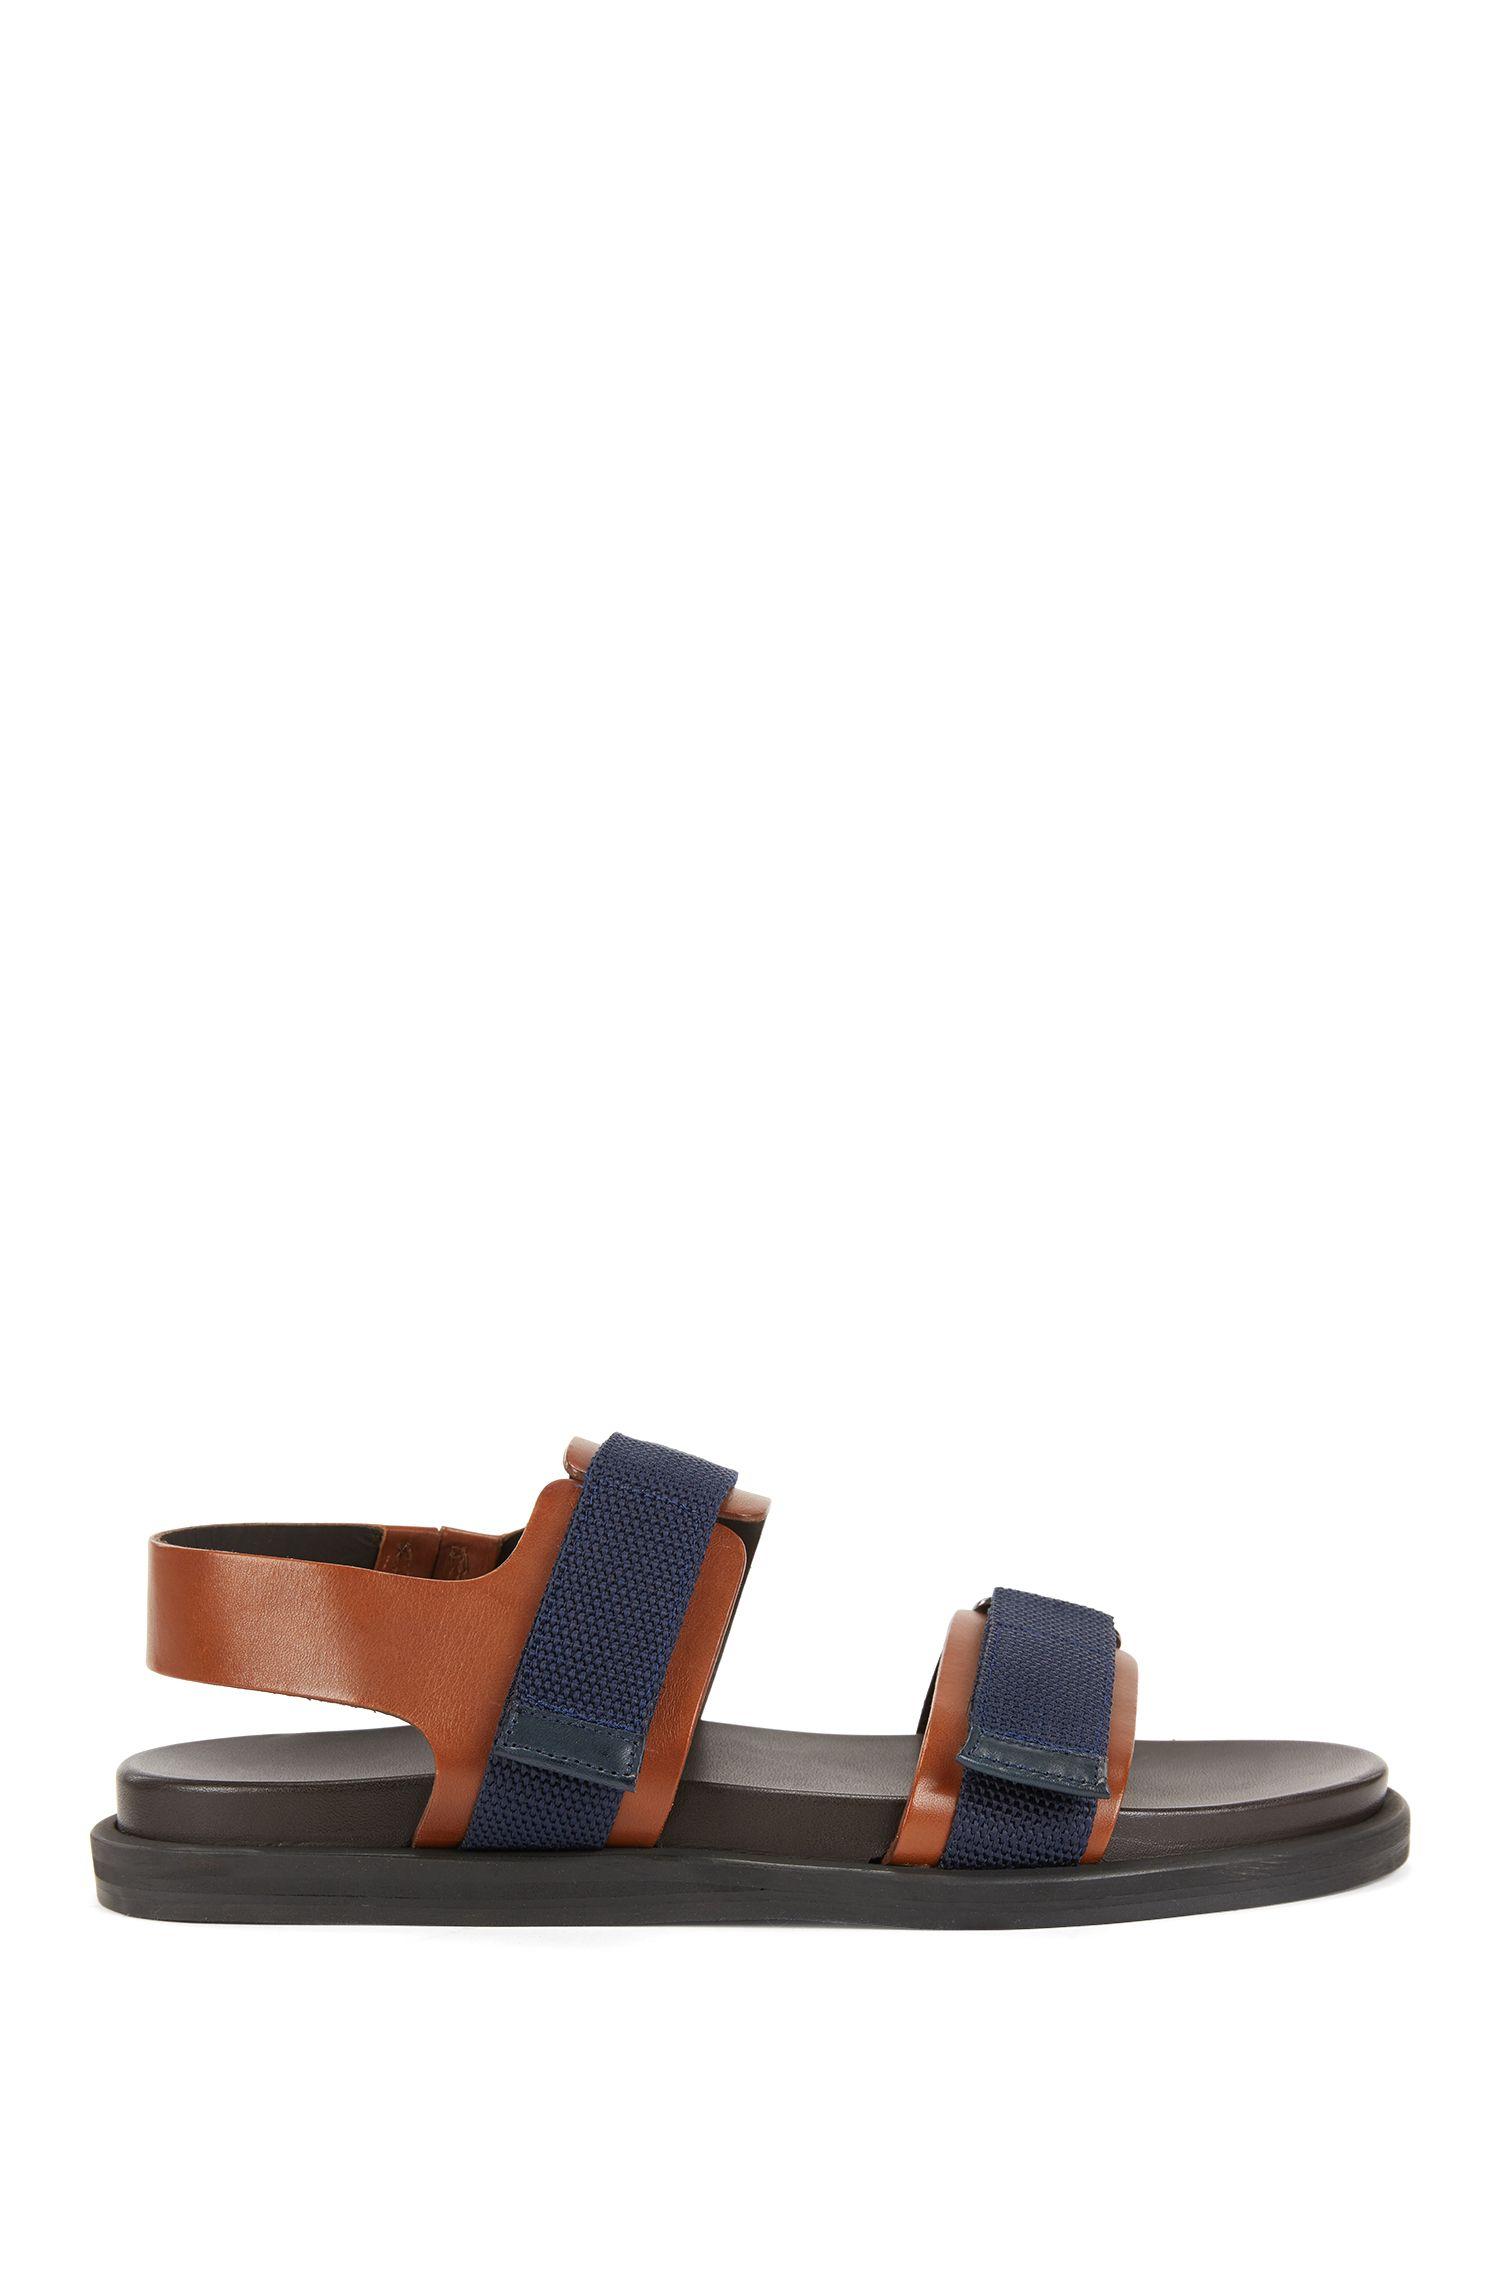 Sandalias de piel de becerro italiana con suela de goma EVA